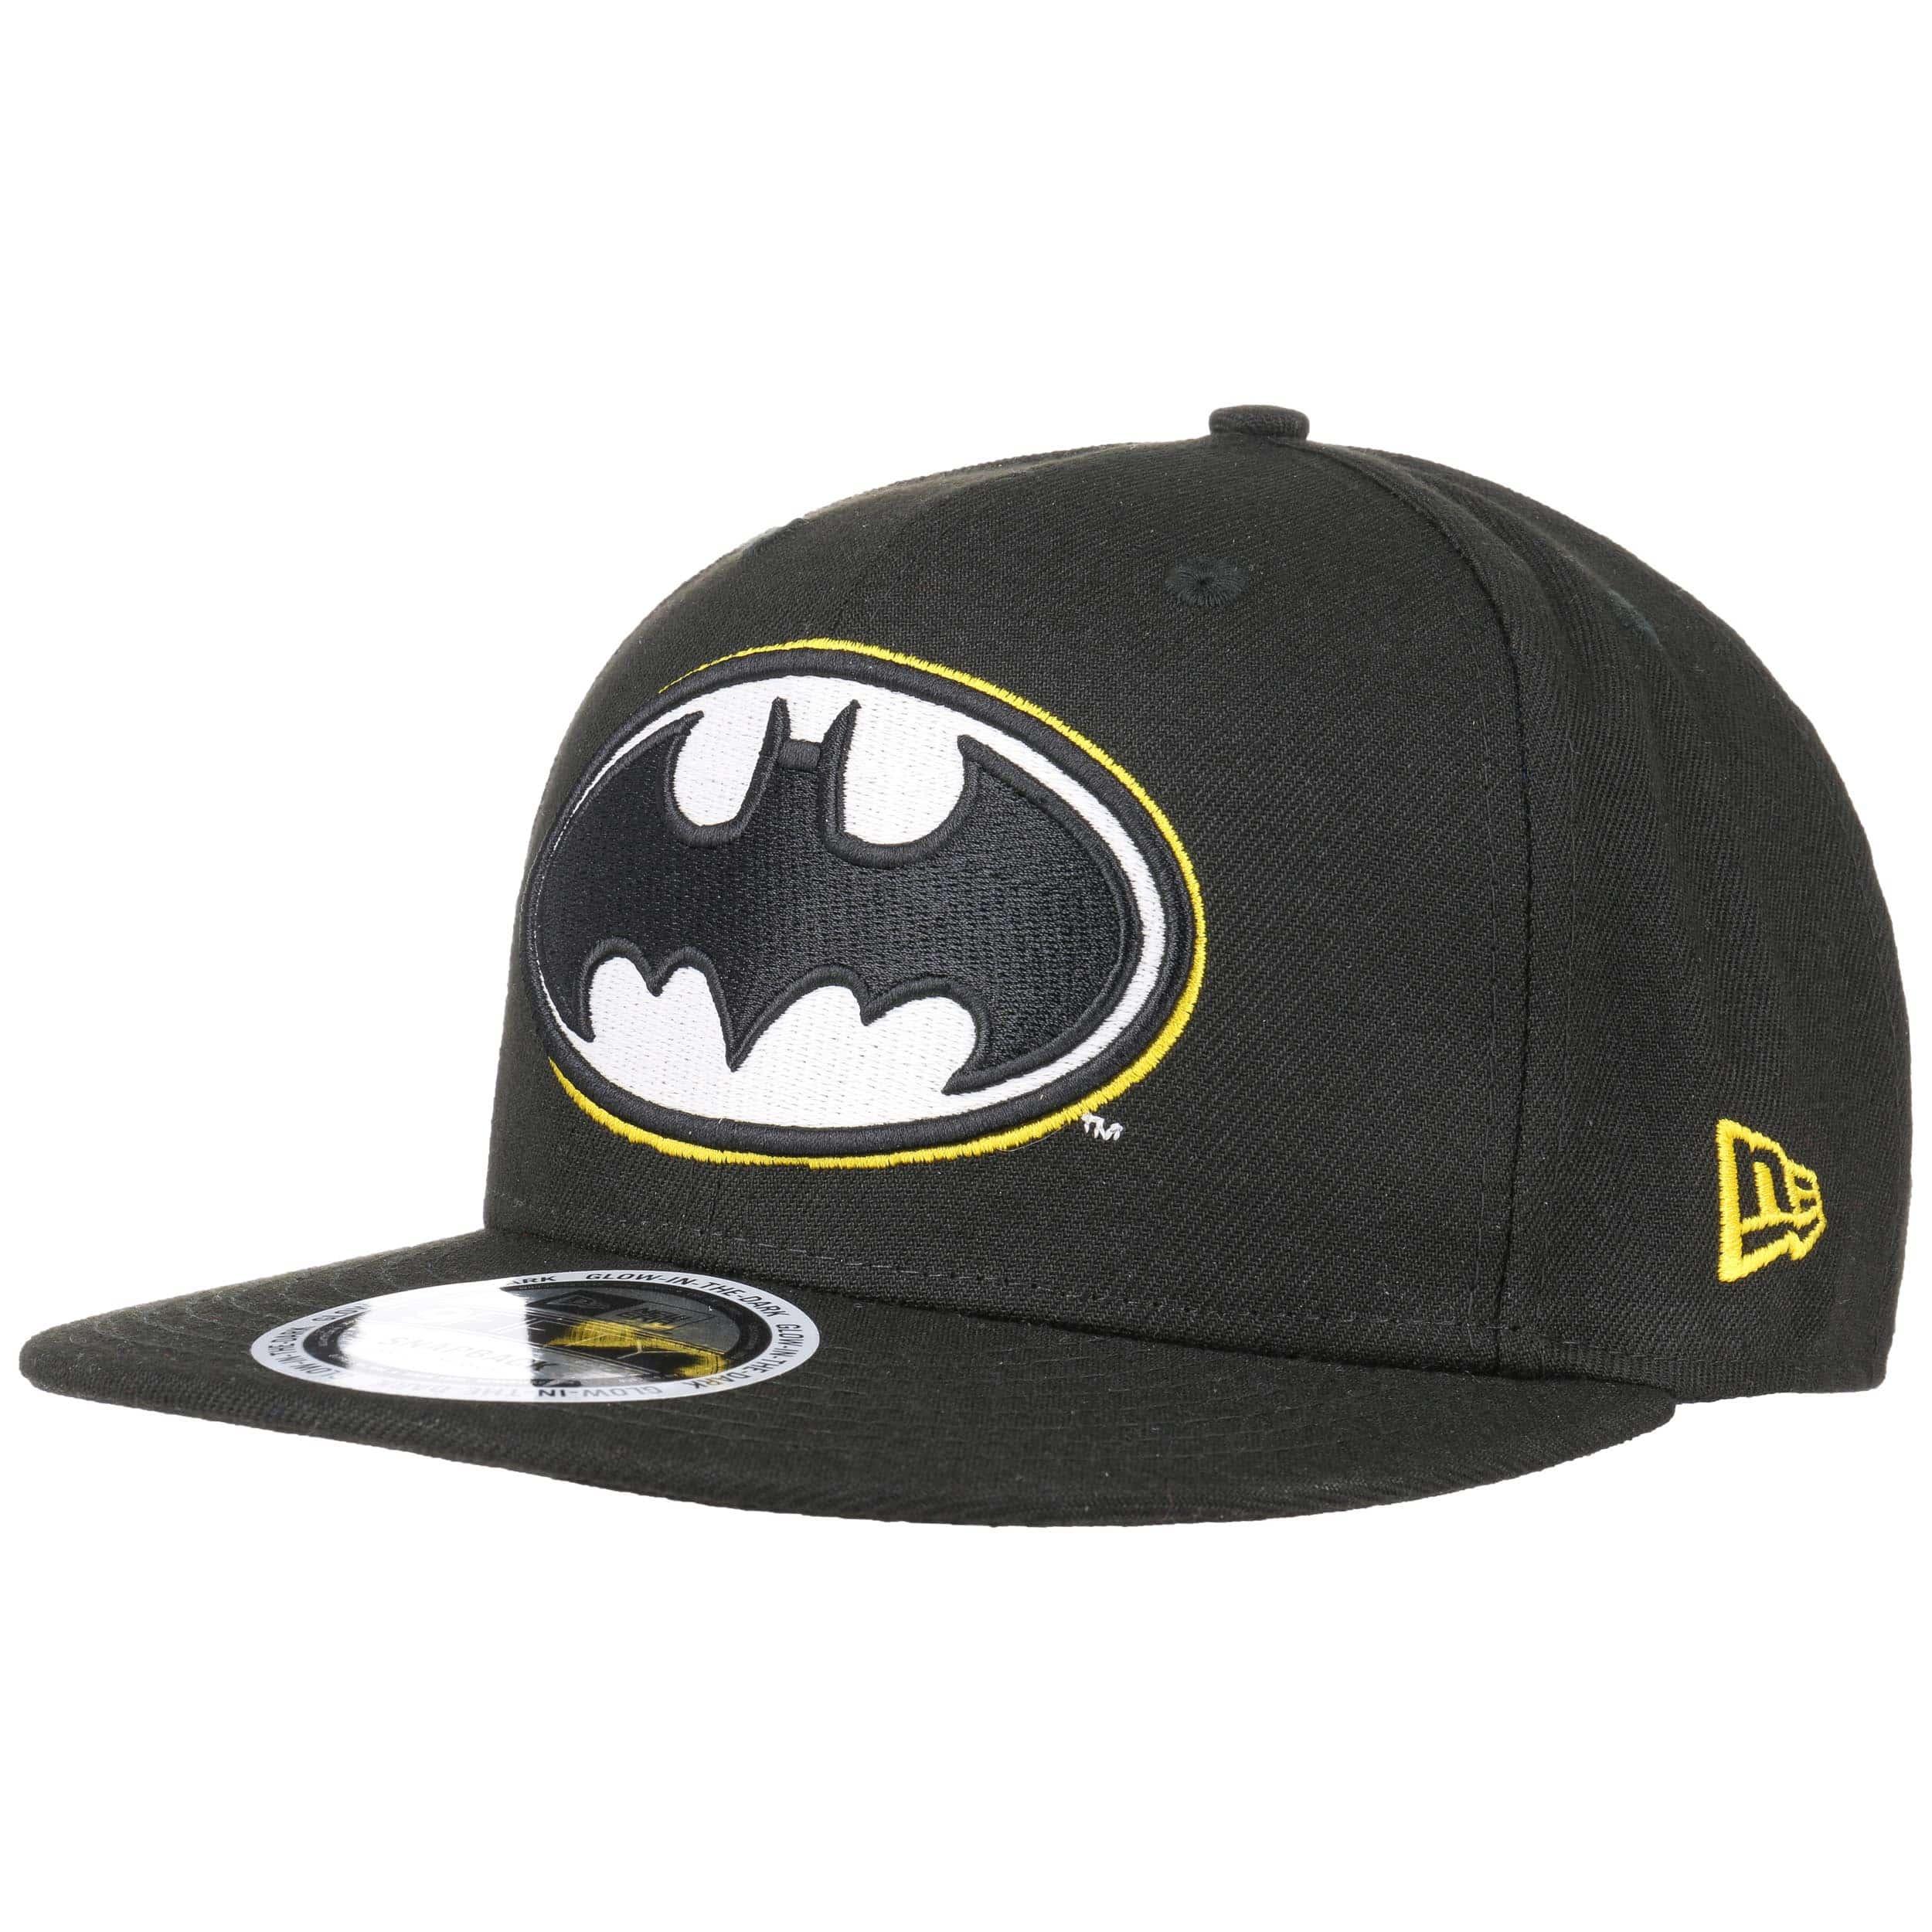 Gorra 9Fifty GITD Batman by New Era - Gorras - sombreroshop.es e584d16afc9e